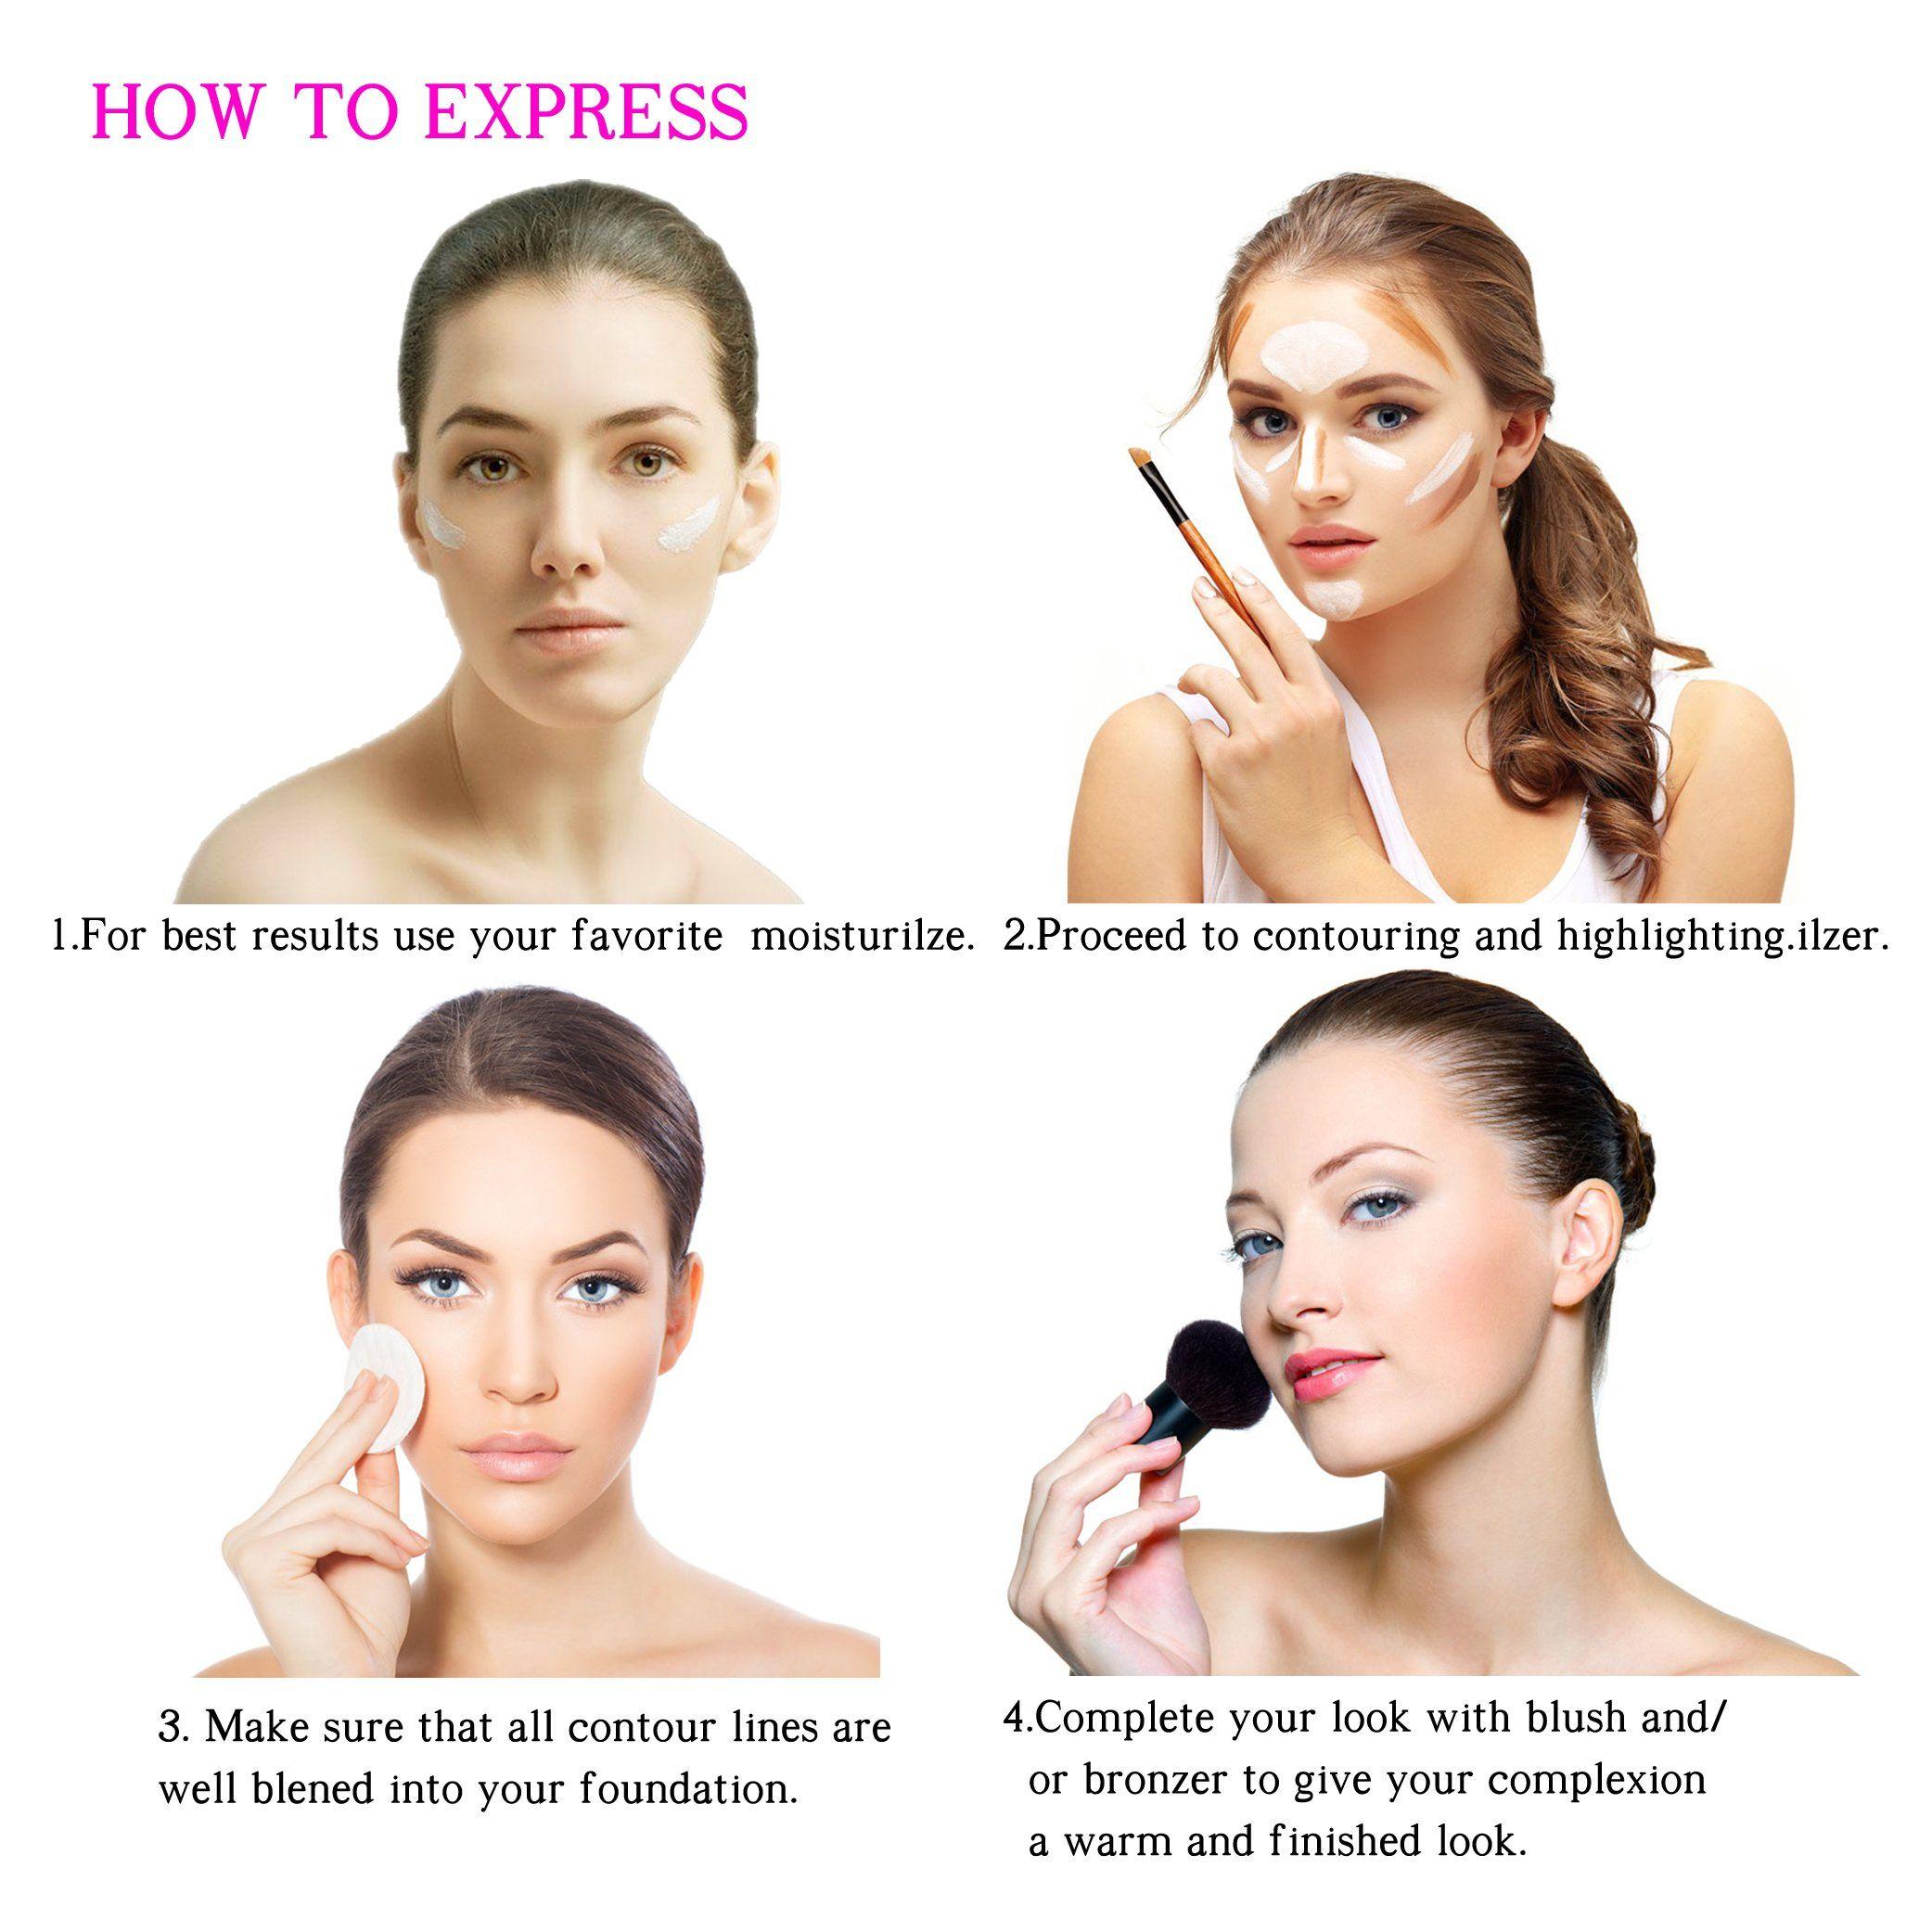 Youngfocus Cream Contour Makeuppalette Kit 8 Colors Cosmetics